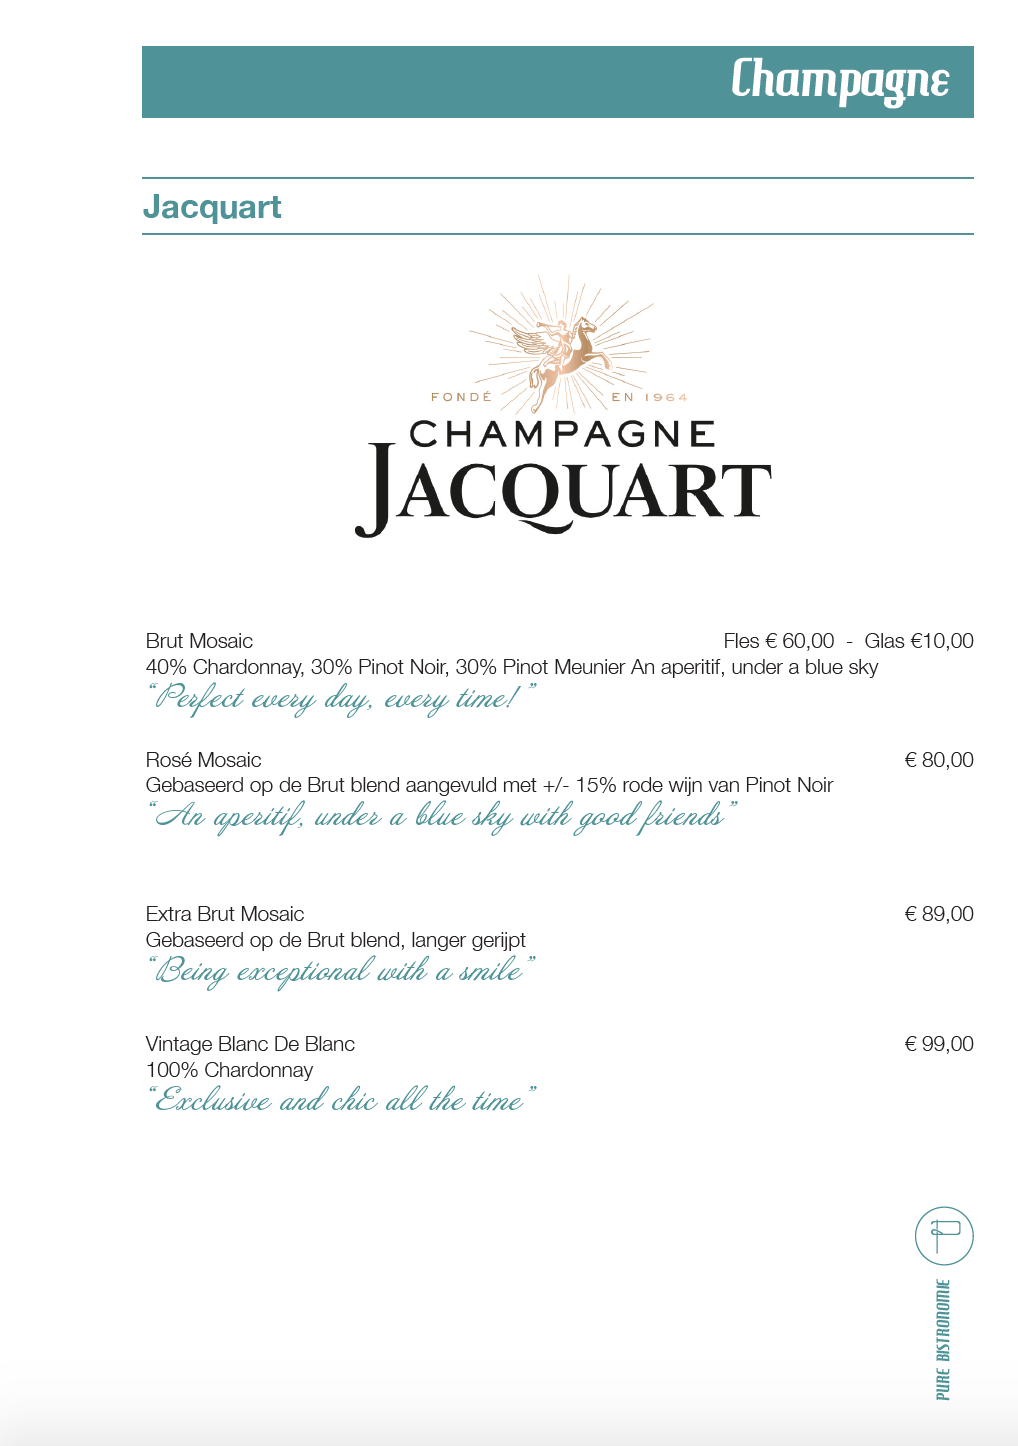 Plaasj-Drank-Champagne